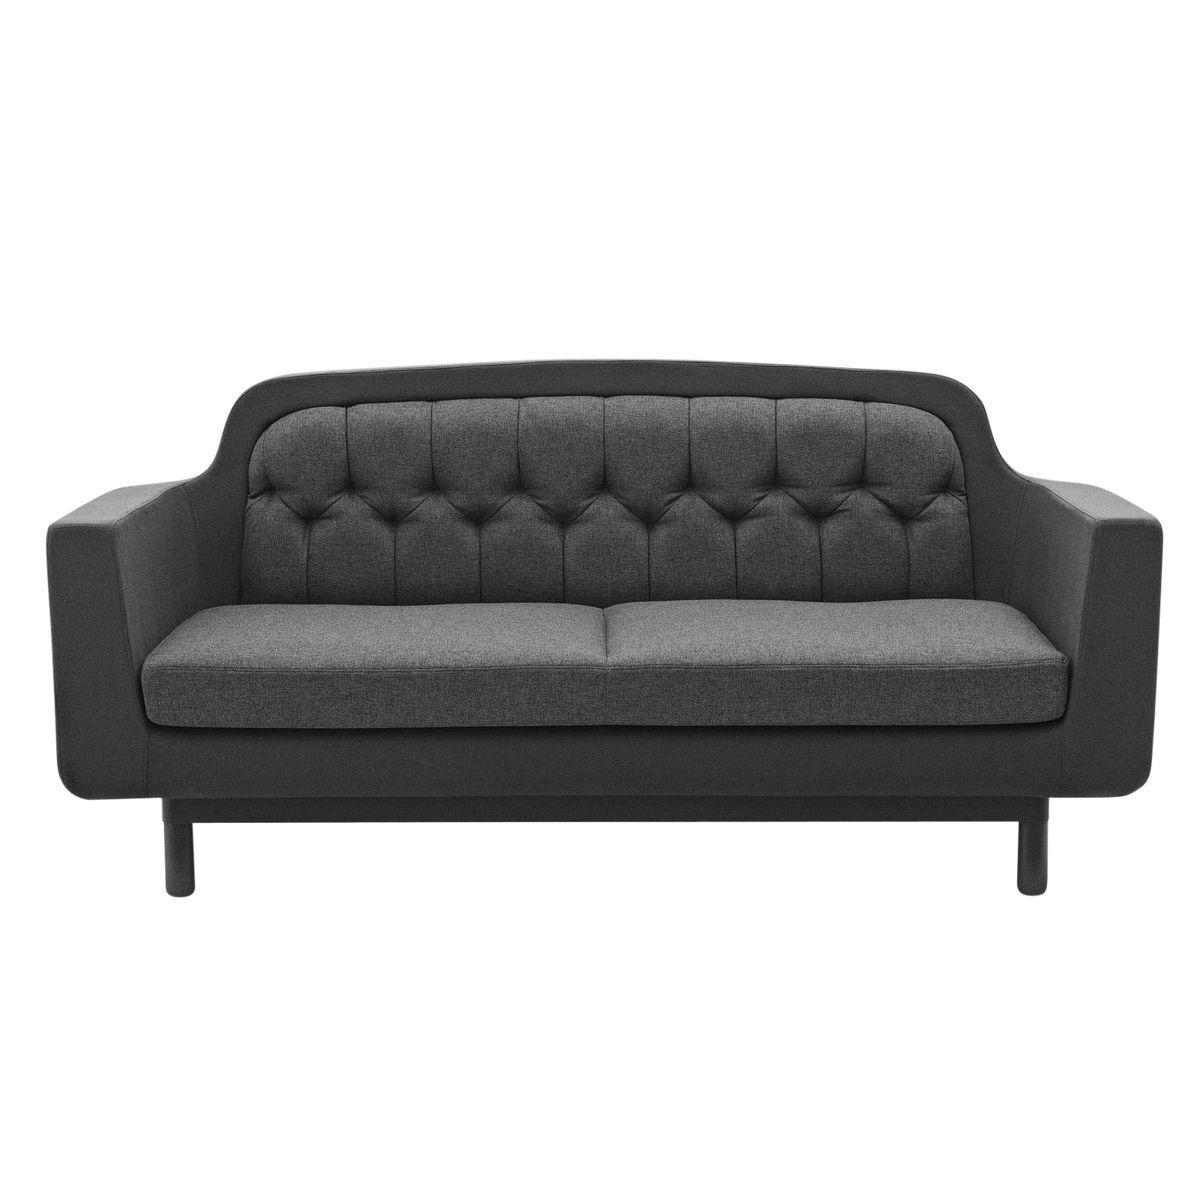 onkel sofa 2 seater normann copenhagen. Black Bedroom Furniture Sets. Home Design Ideas